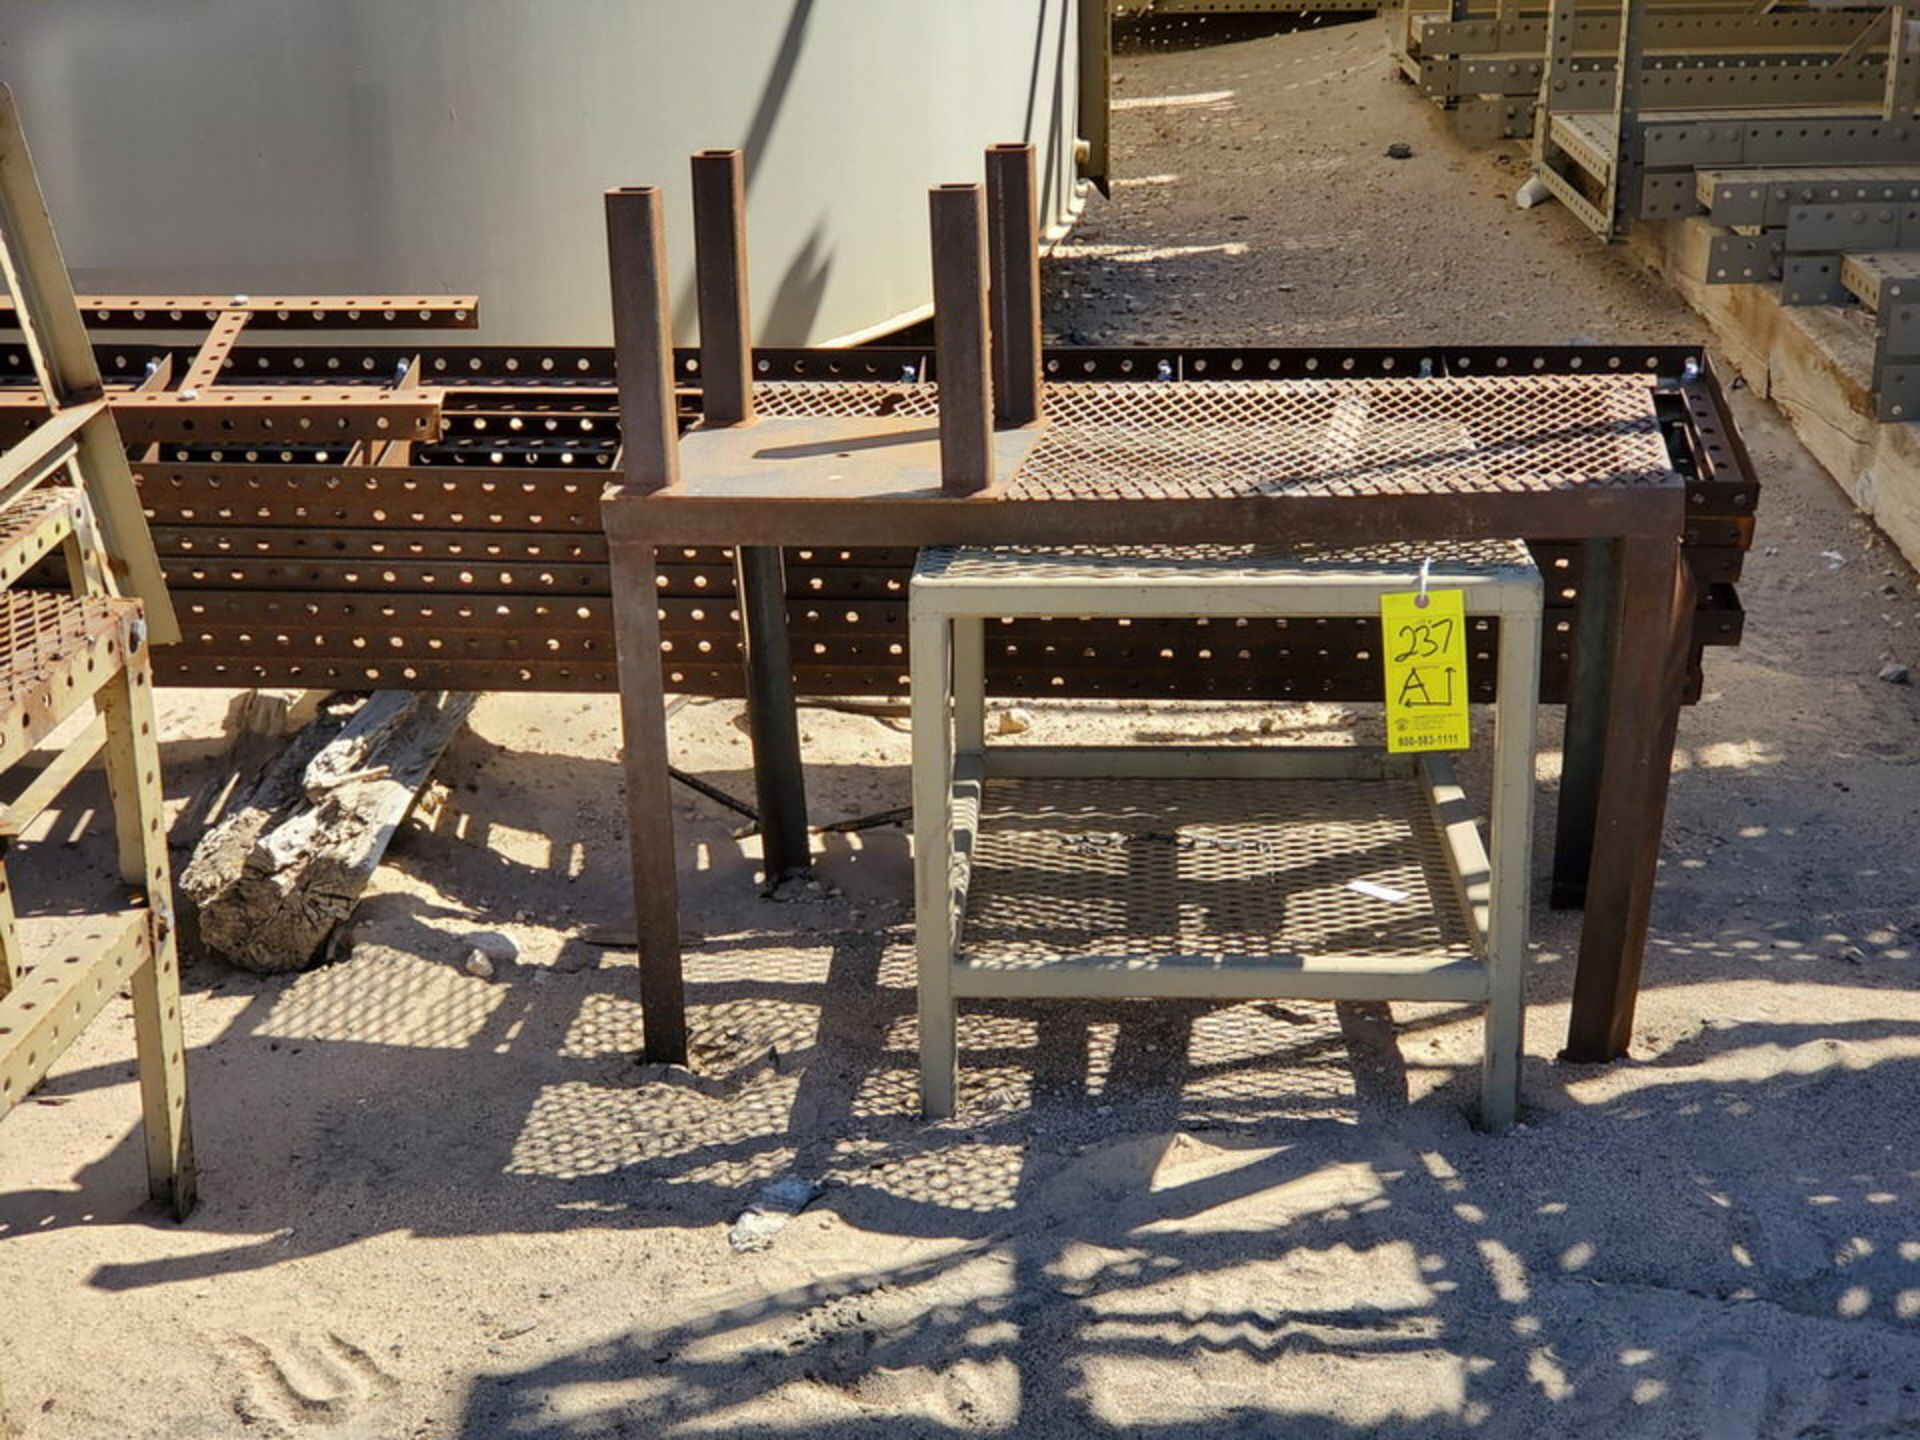 "Assorted Stl Matl. Racks & Ladders Size Range: 30"" x 26"" x 25""H - 29"" x 48"" x 50""H - Image 12 of 18"